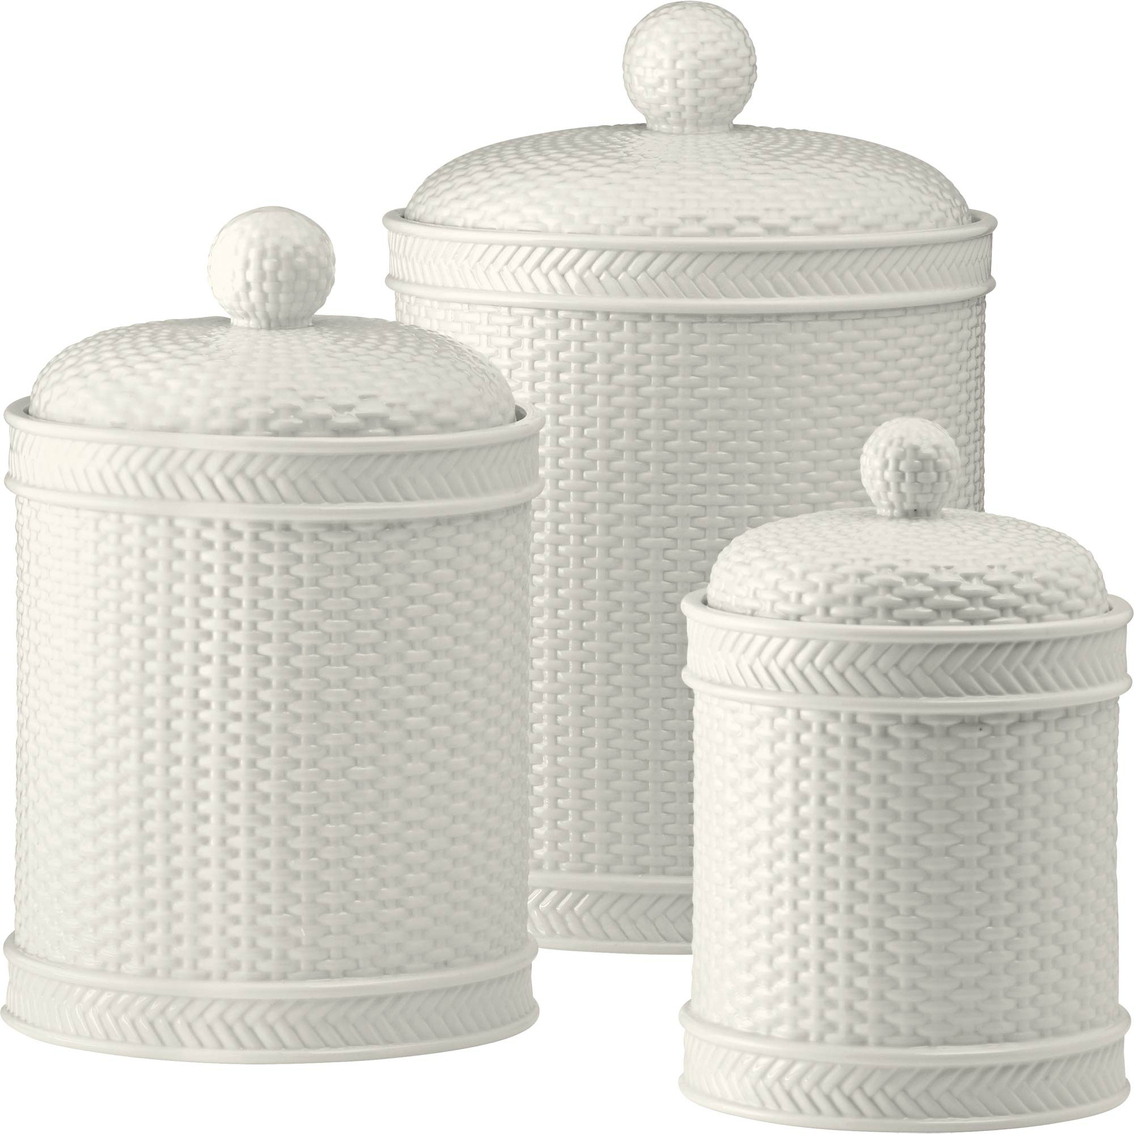 Martha Stewart Boot Tray Martha Stewart Collection Whiteware Basketweave 3 Pc Canister Set